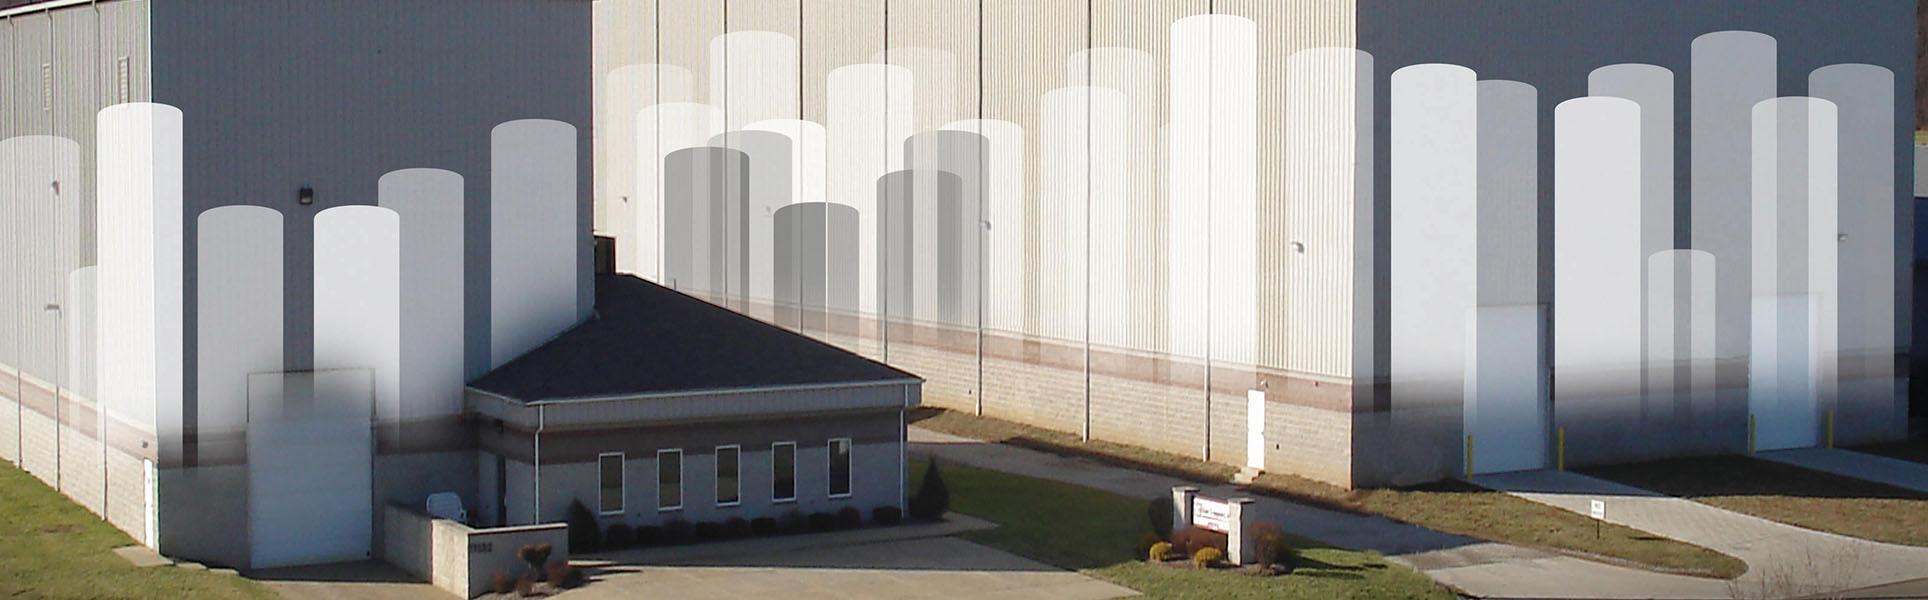 Carousel Image 4 - Eleet Building